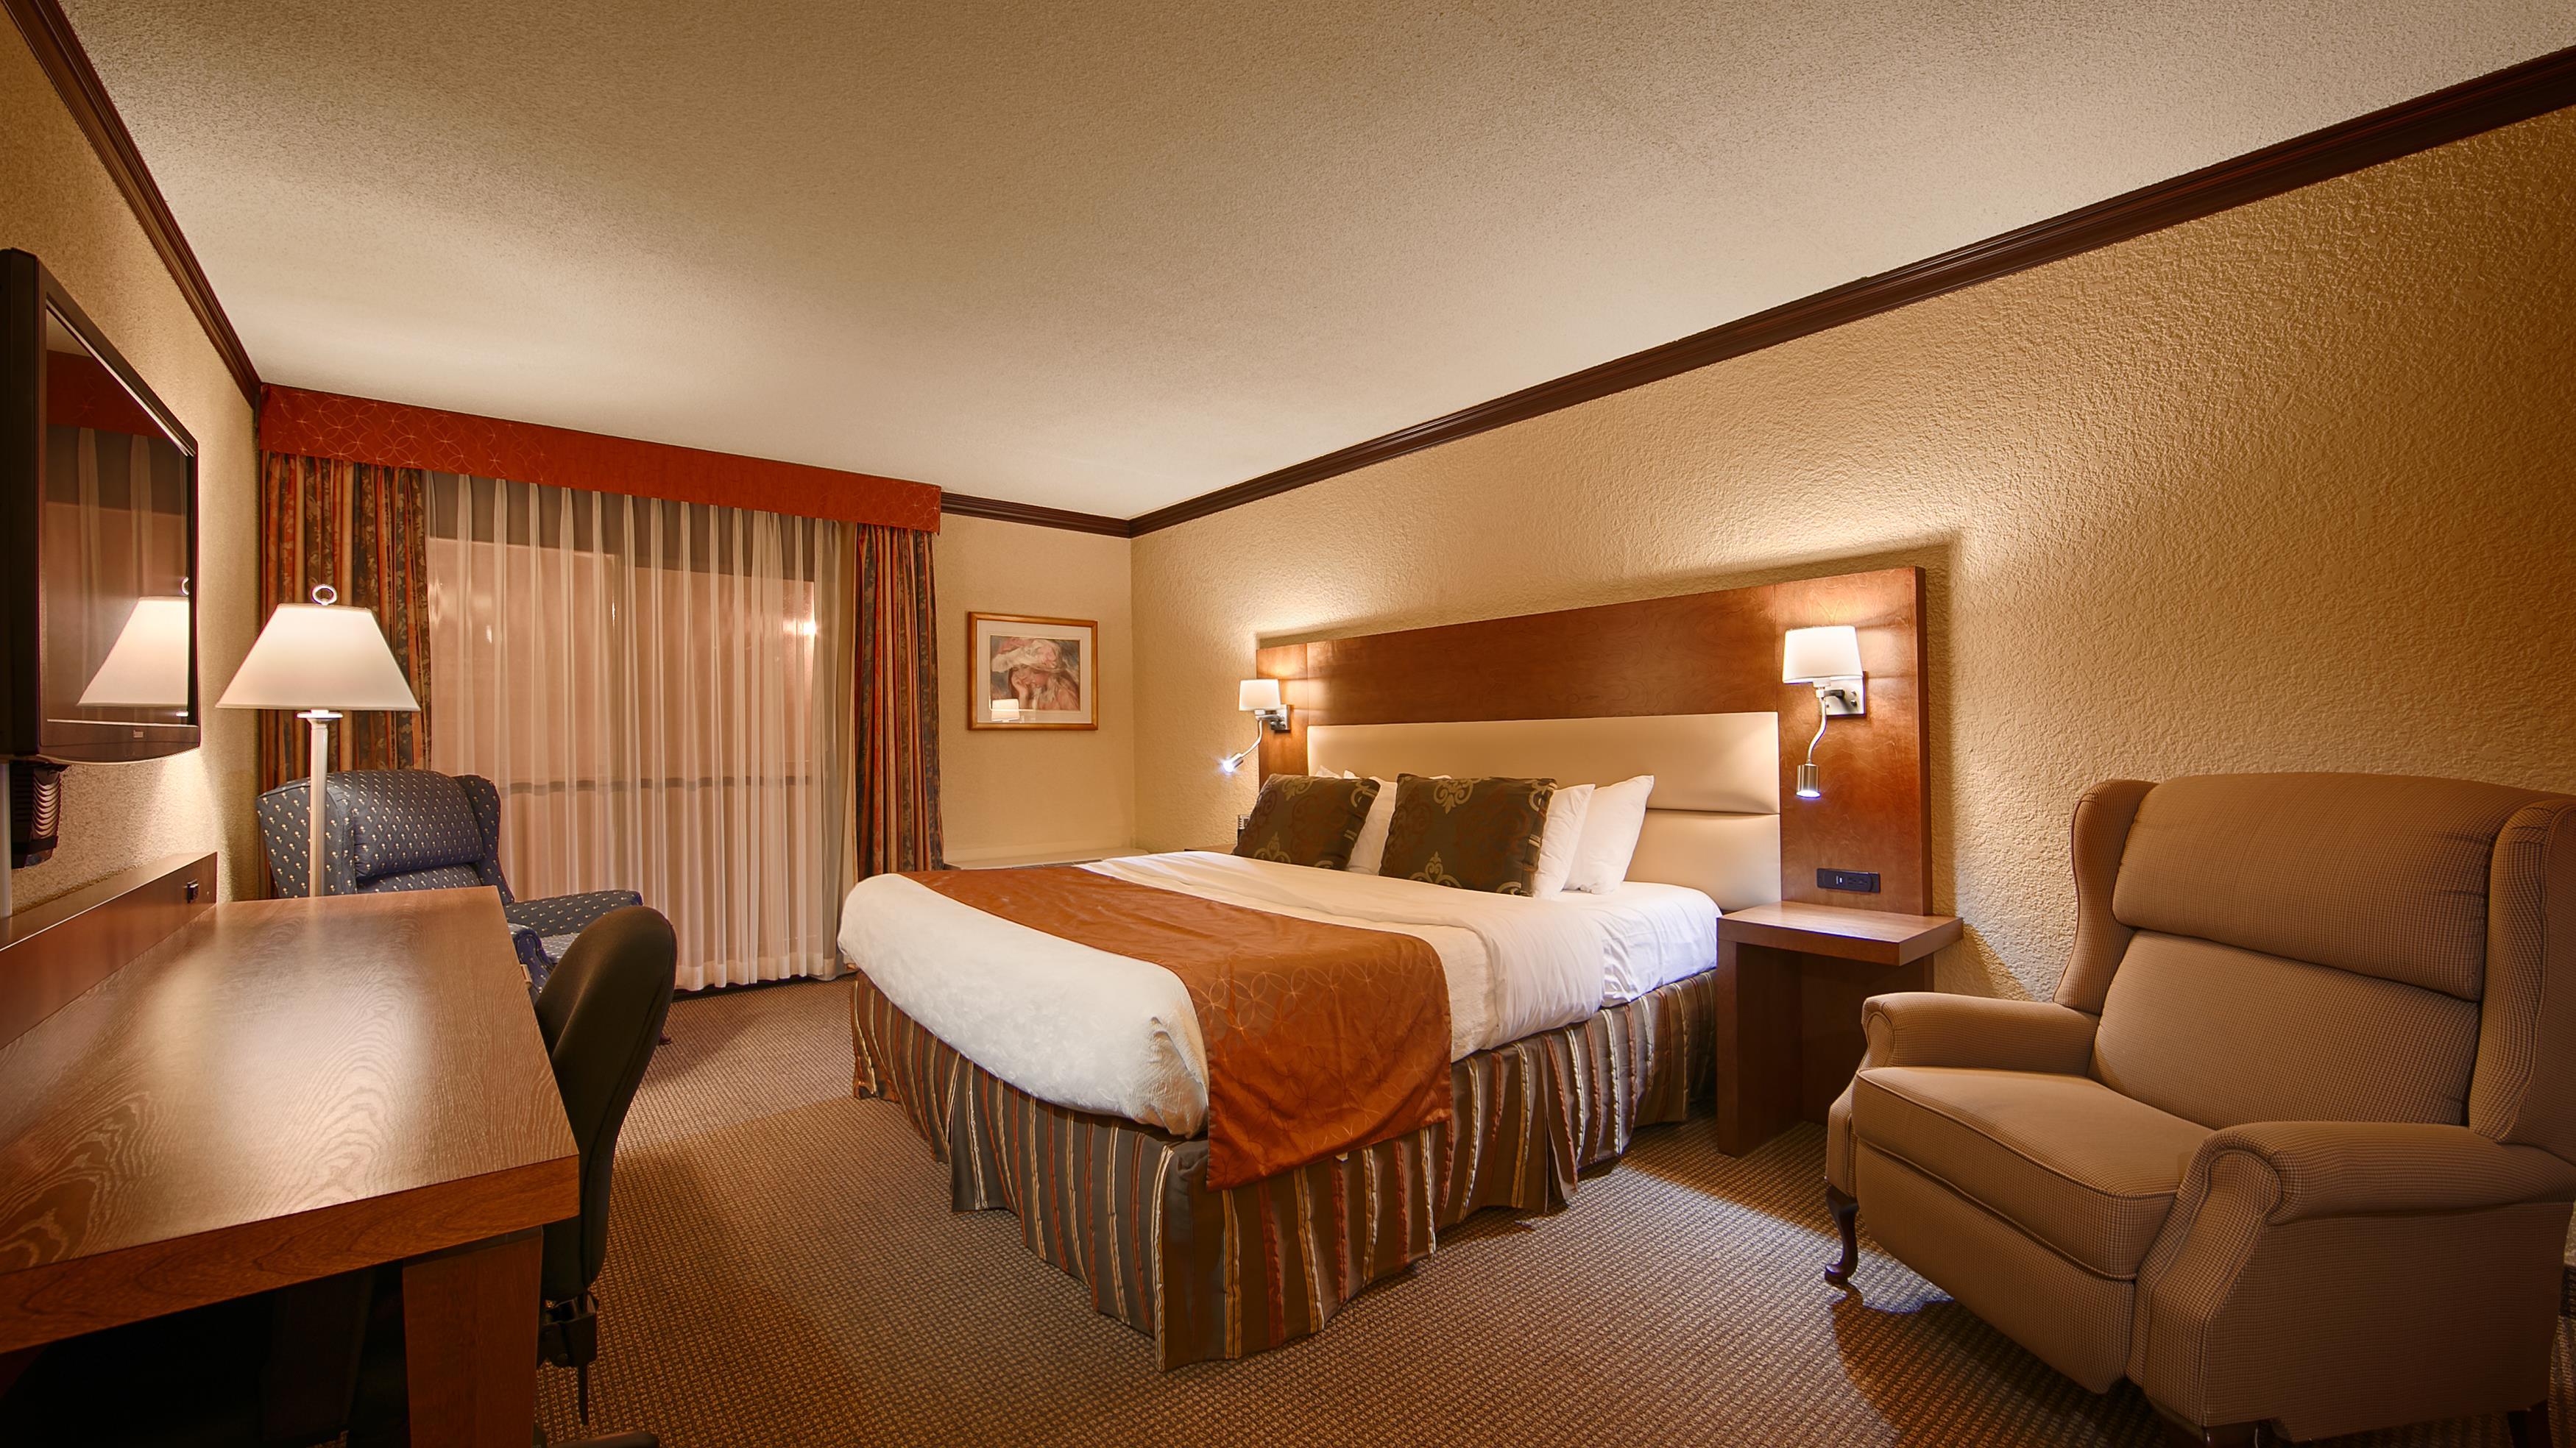 Best Western Hotel Universel Drummondville à Drummondville: King Room